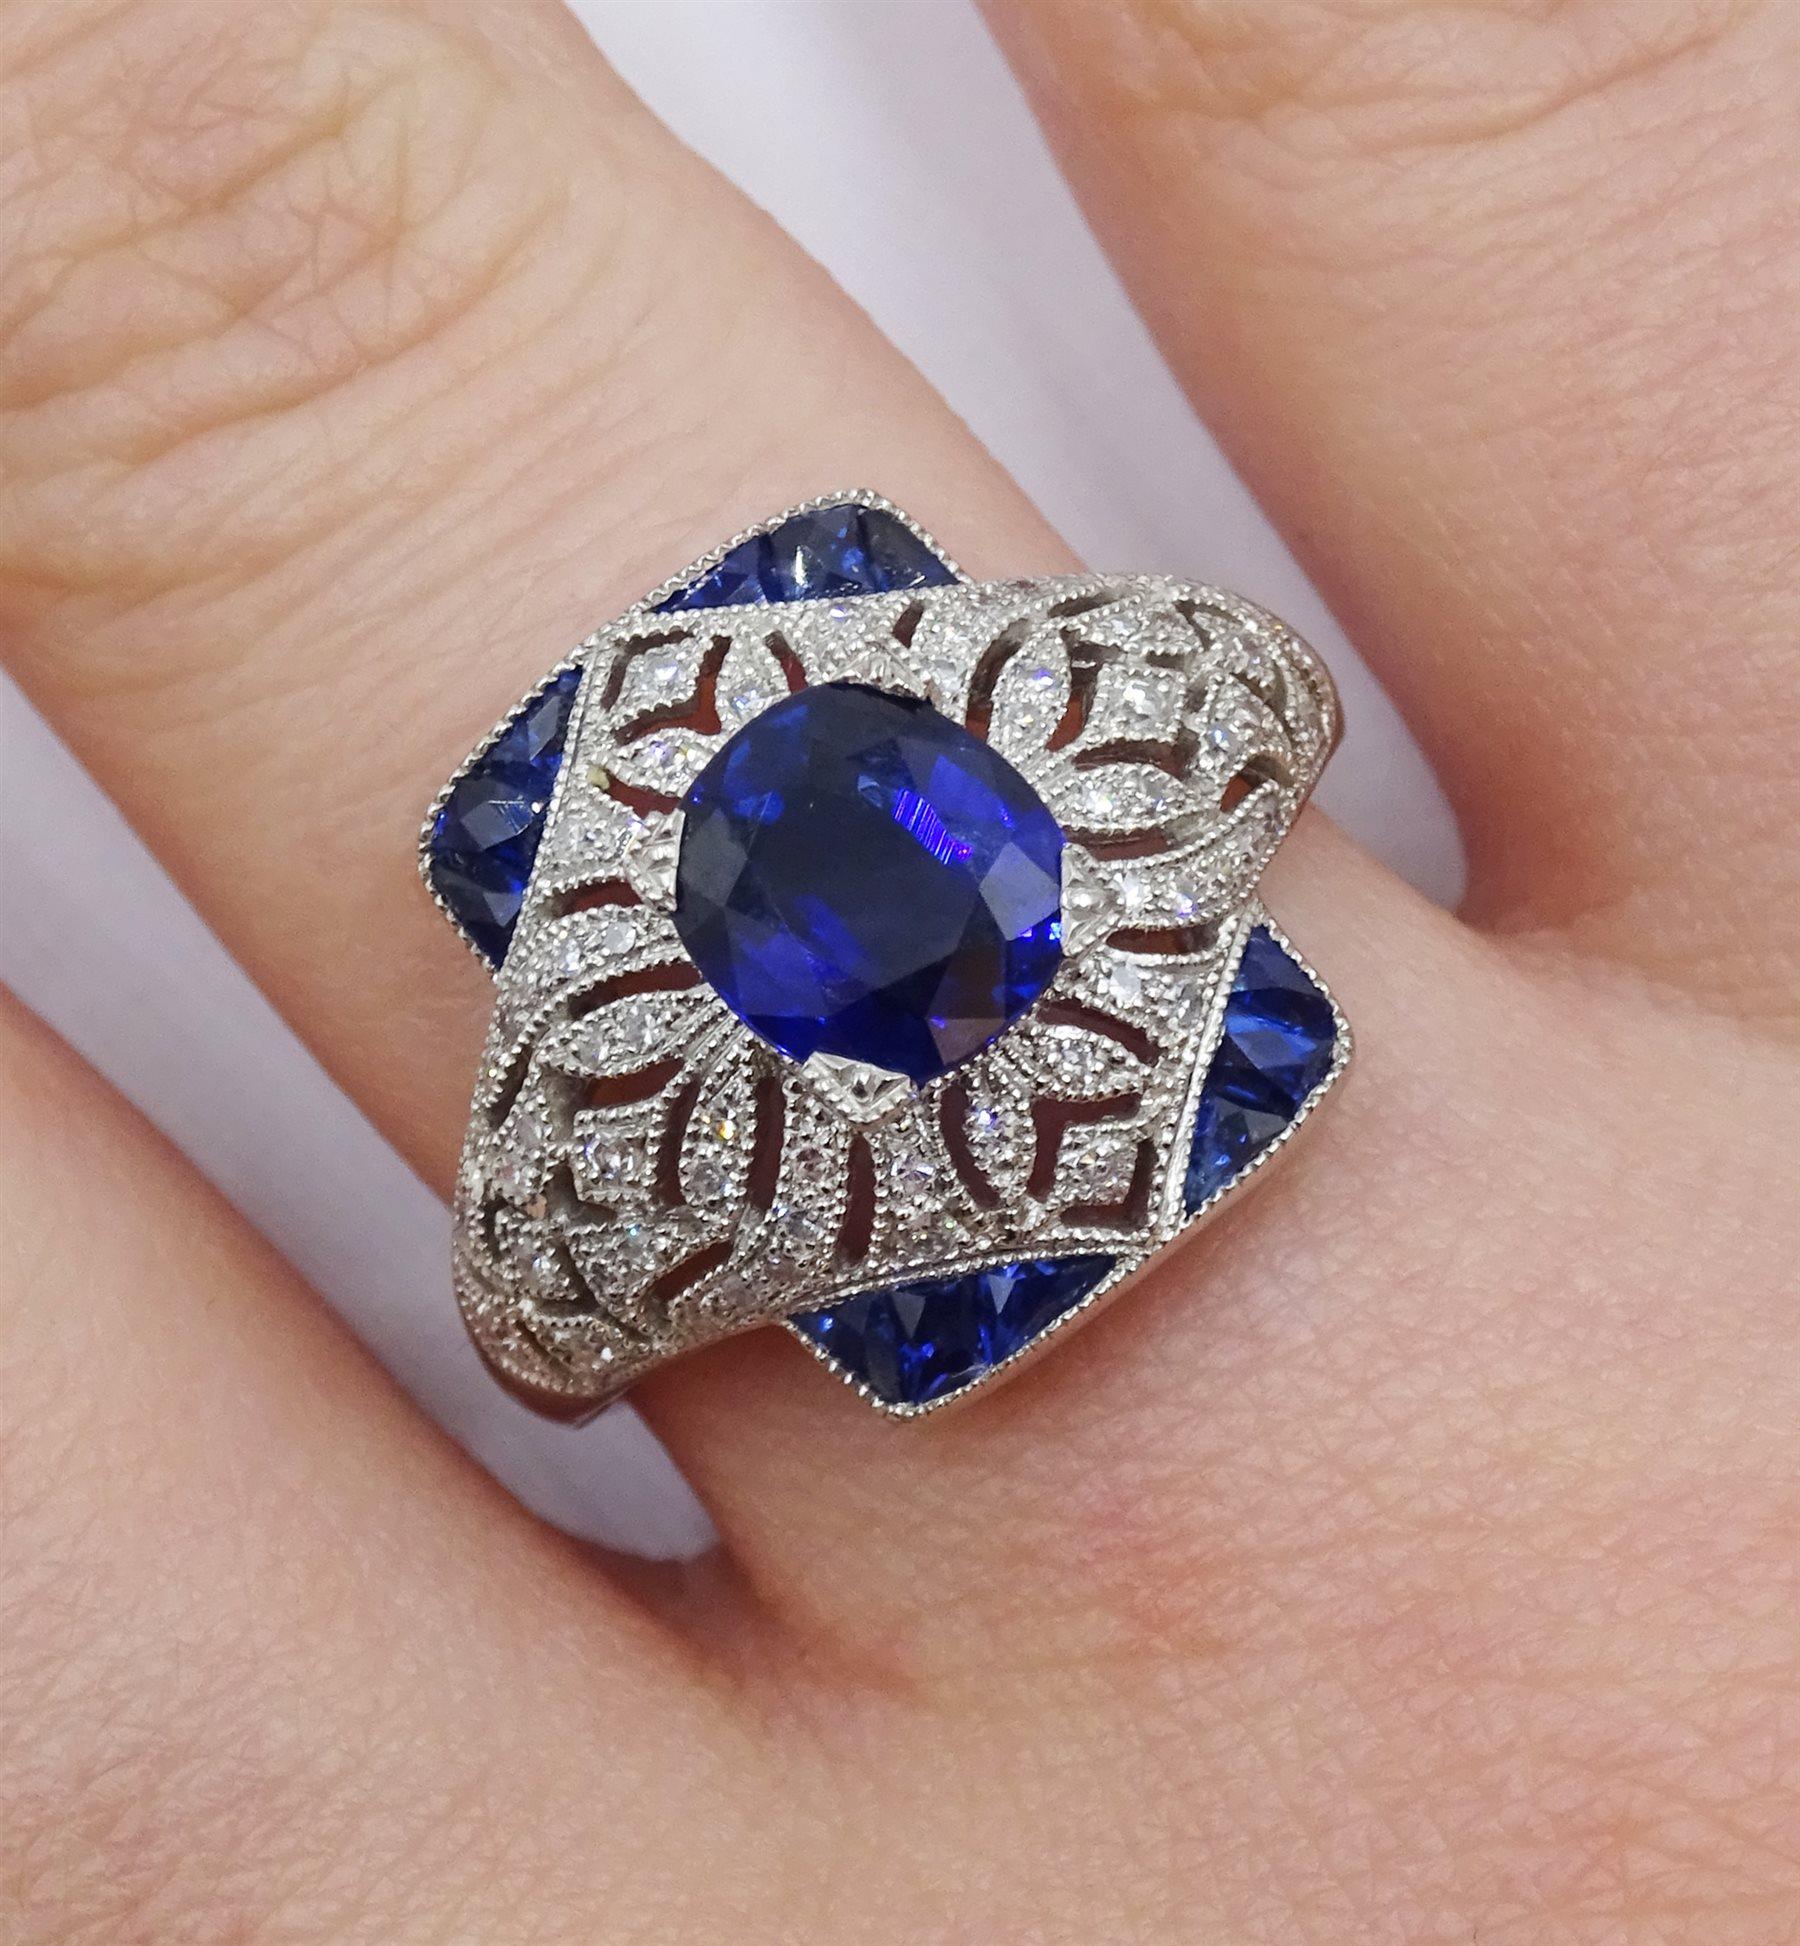 Platinum sapphire and diamond dress ring - Image 2 of 6